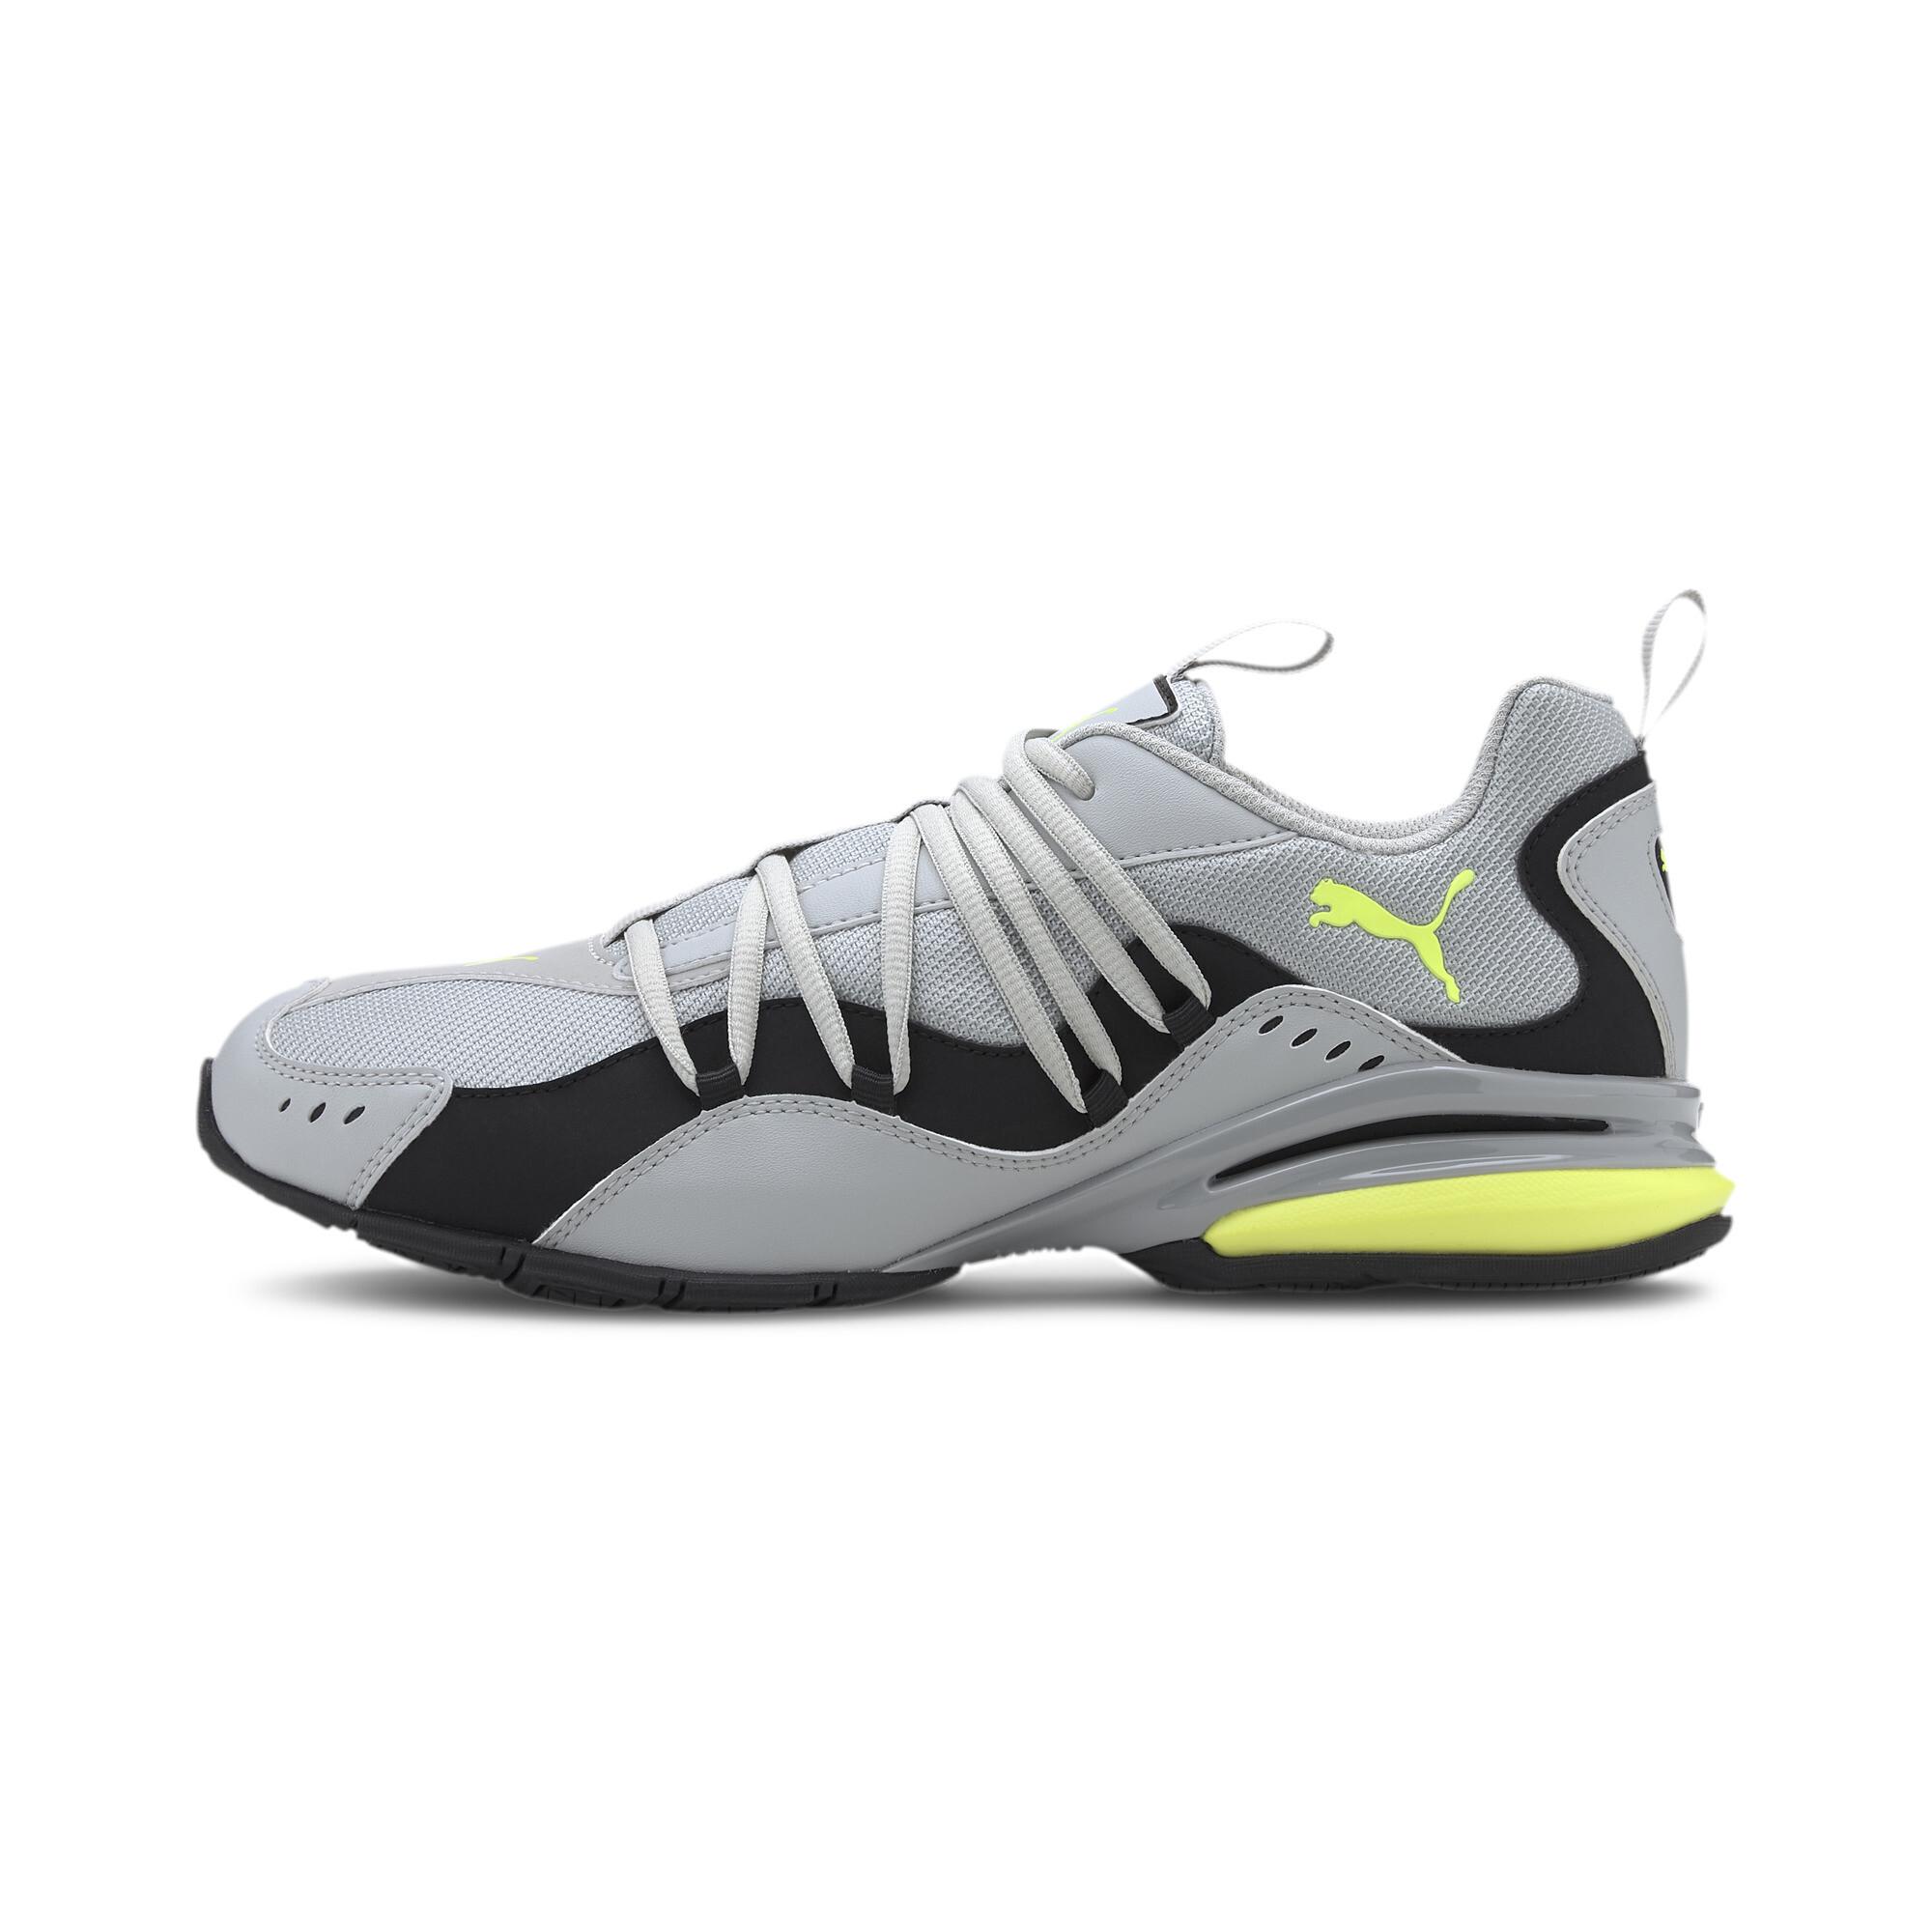 PUMA-Silverion-Men-s-Running-Shoes-Men-Shoe-Running thumbnail 19